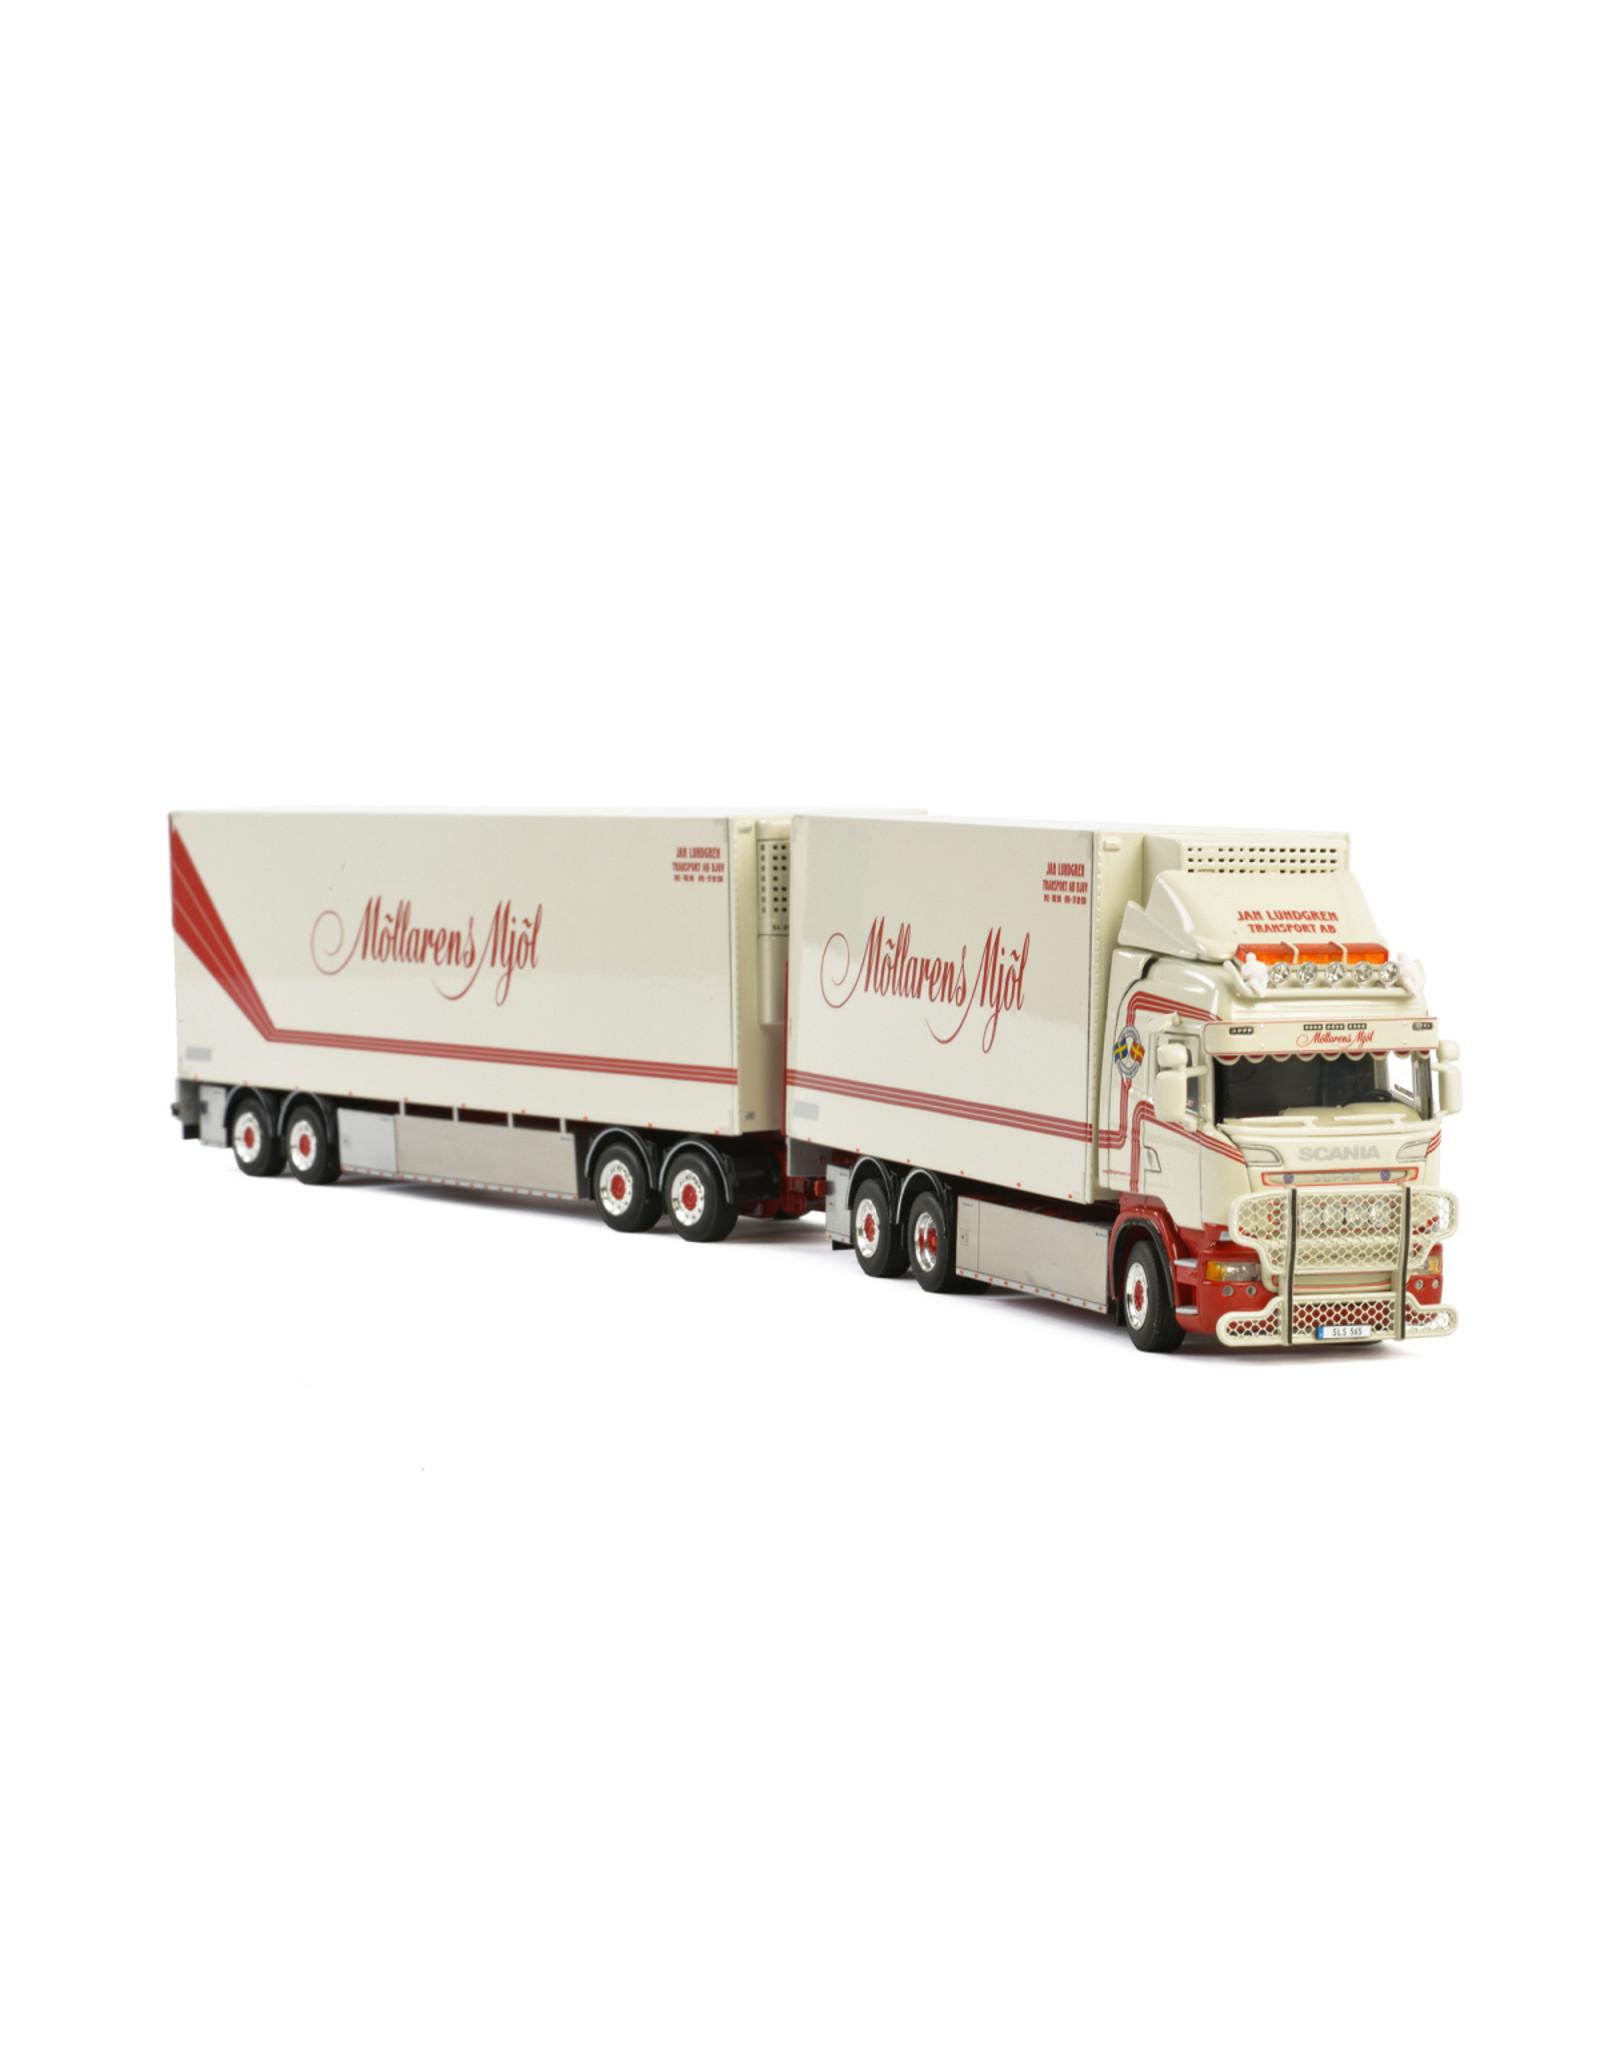 Scania Scania Streamline Highline Reefer Rigid Truck 6x2 Tag Axle + Dolly 2 axle + Reefer  Box Trailer 2 axle 'Jan Lundgren Transport' - 1:50 - WSI Models